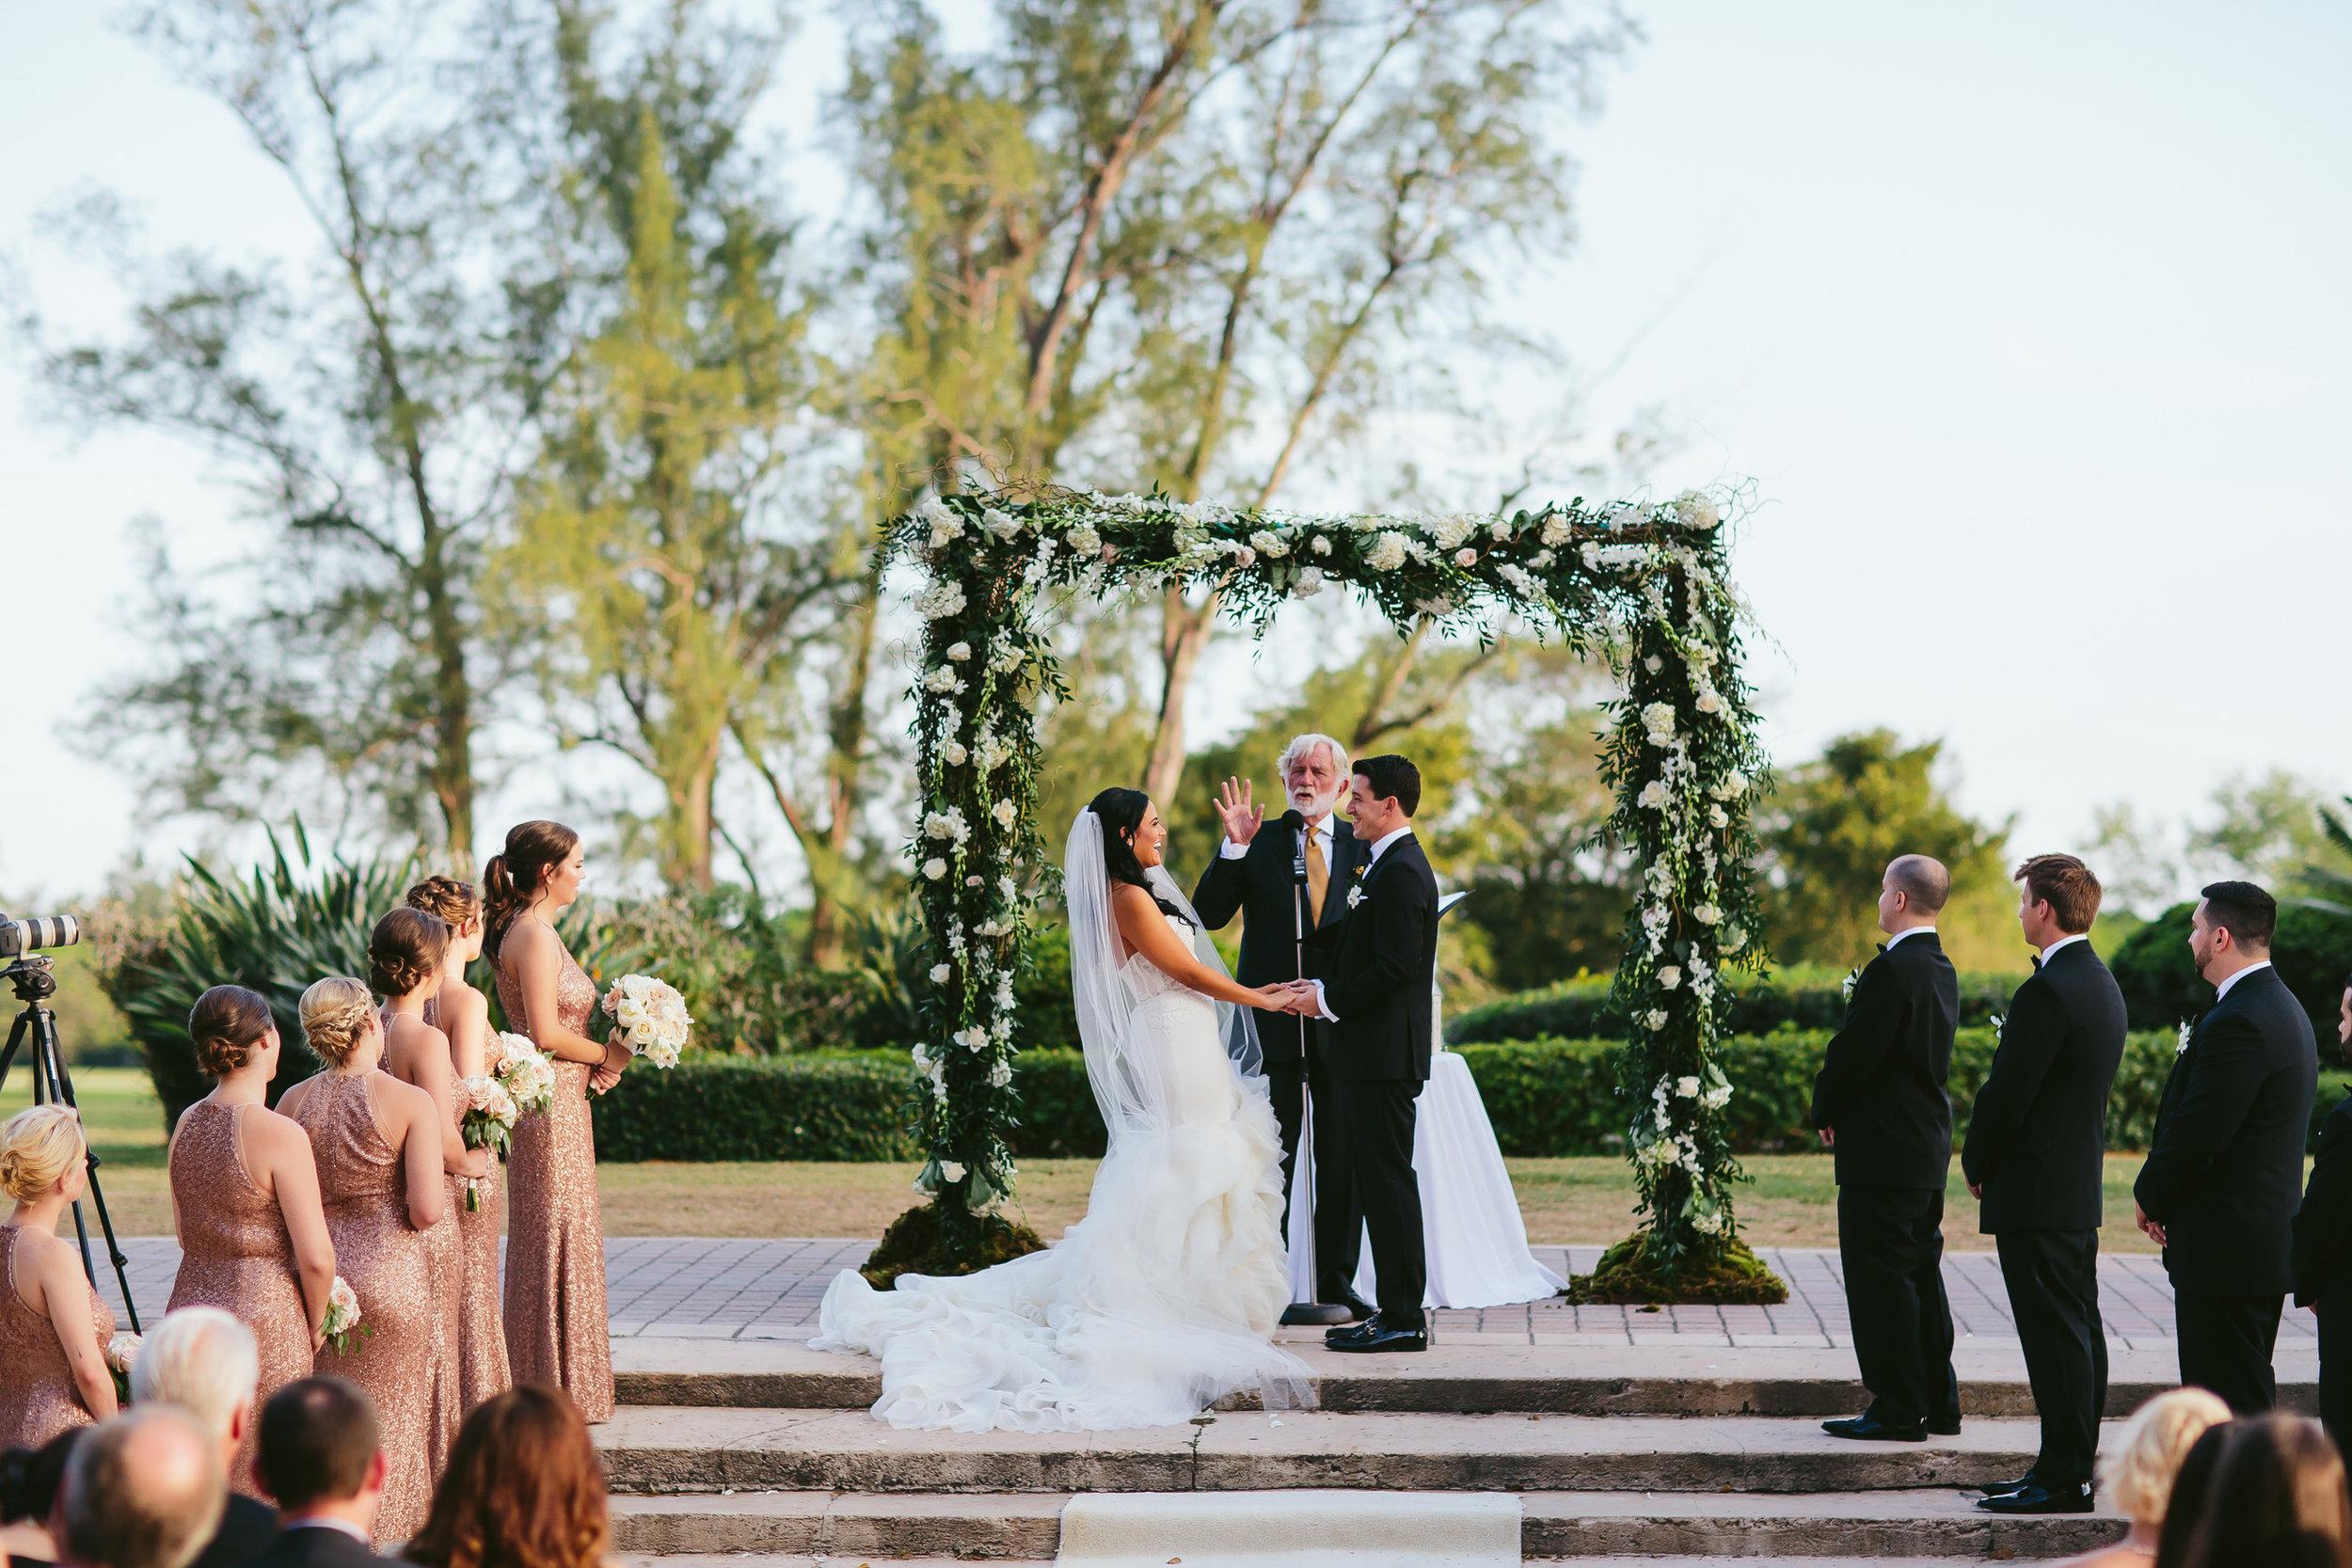 miami-biltmore-wedding-photographer-ceremony-steph-lynn-photo-21.jpg